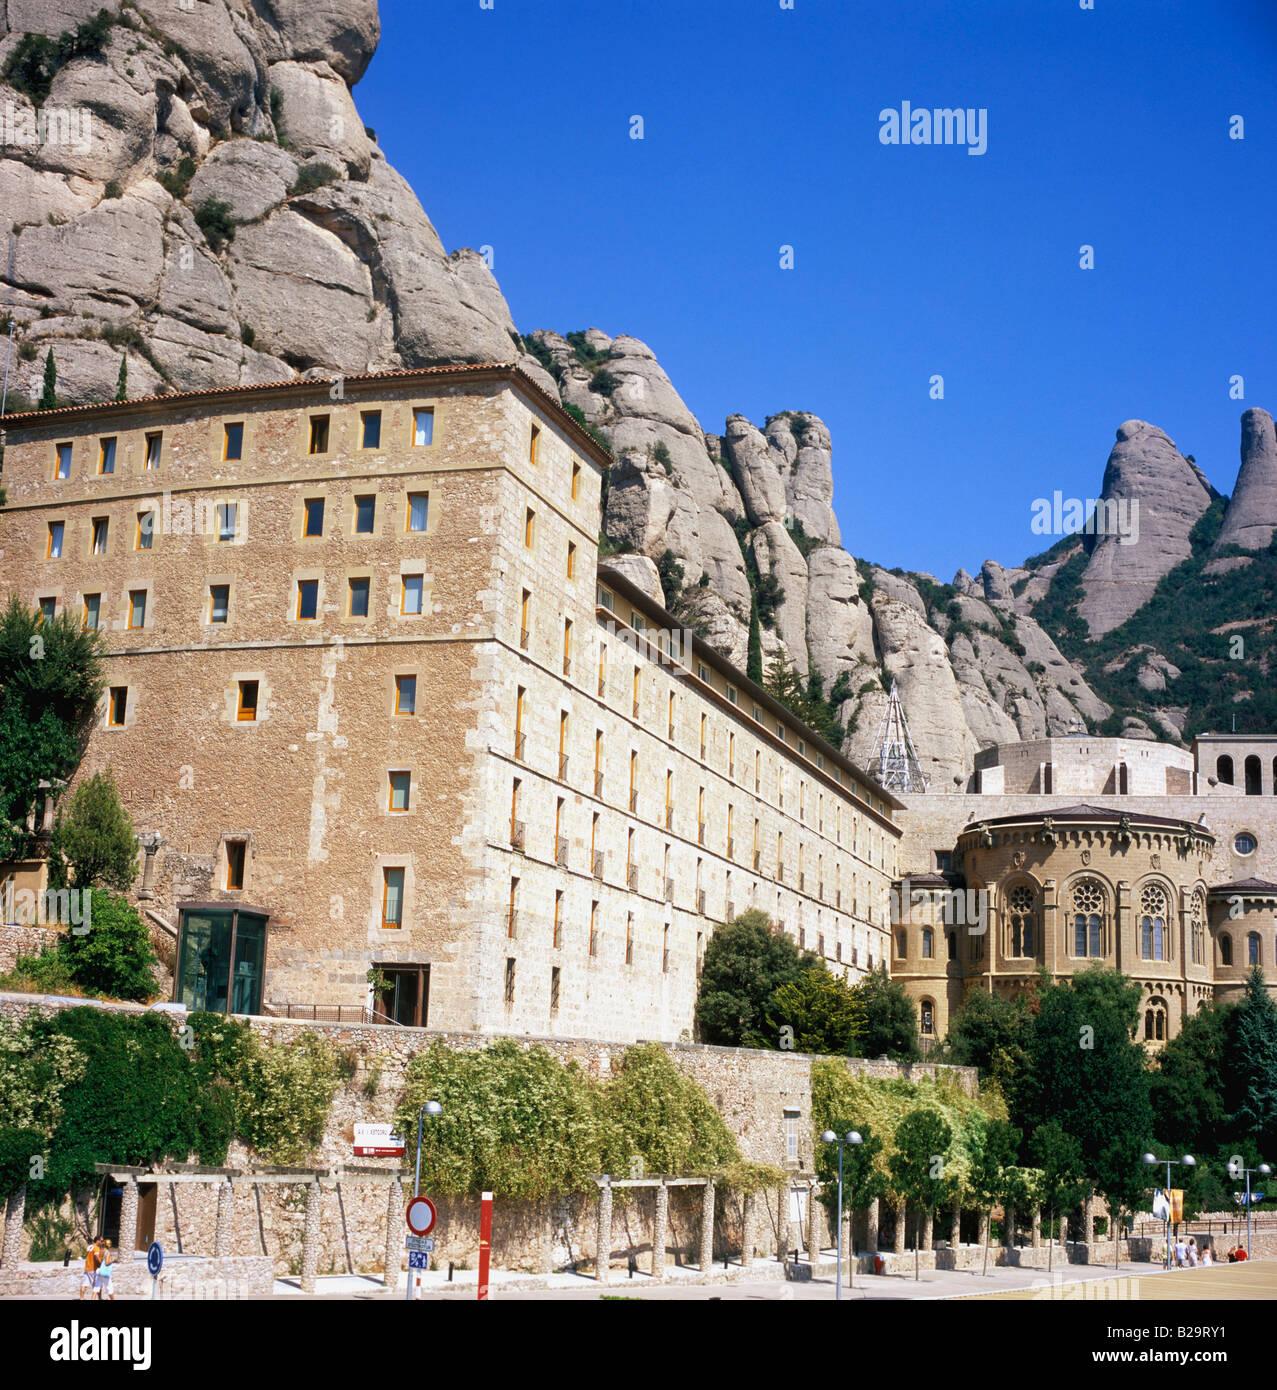 Montserrat Spain Ref WP LAKE 2002 COMPULSORY CREDIT World Pictures Photoshot - Stock Image